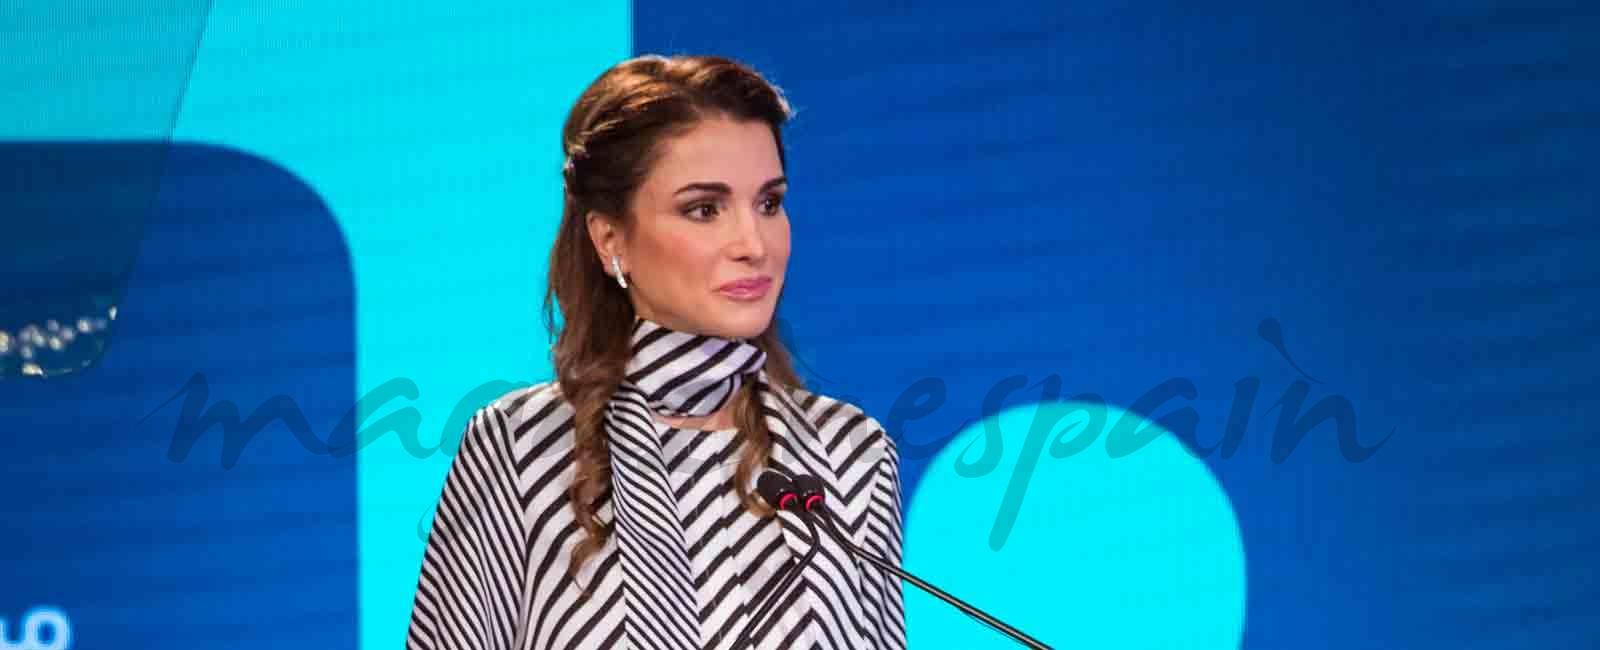 La reina Rania de Jordania, elegancia en blanco y negro